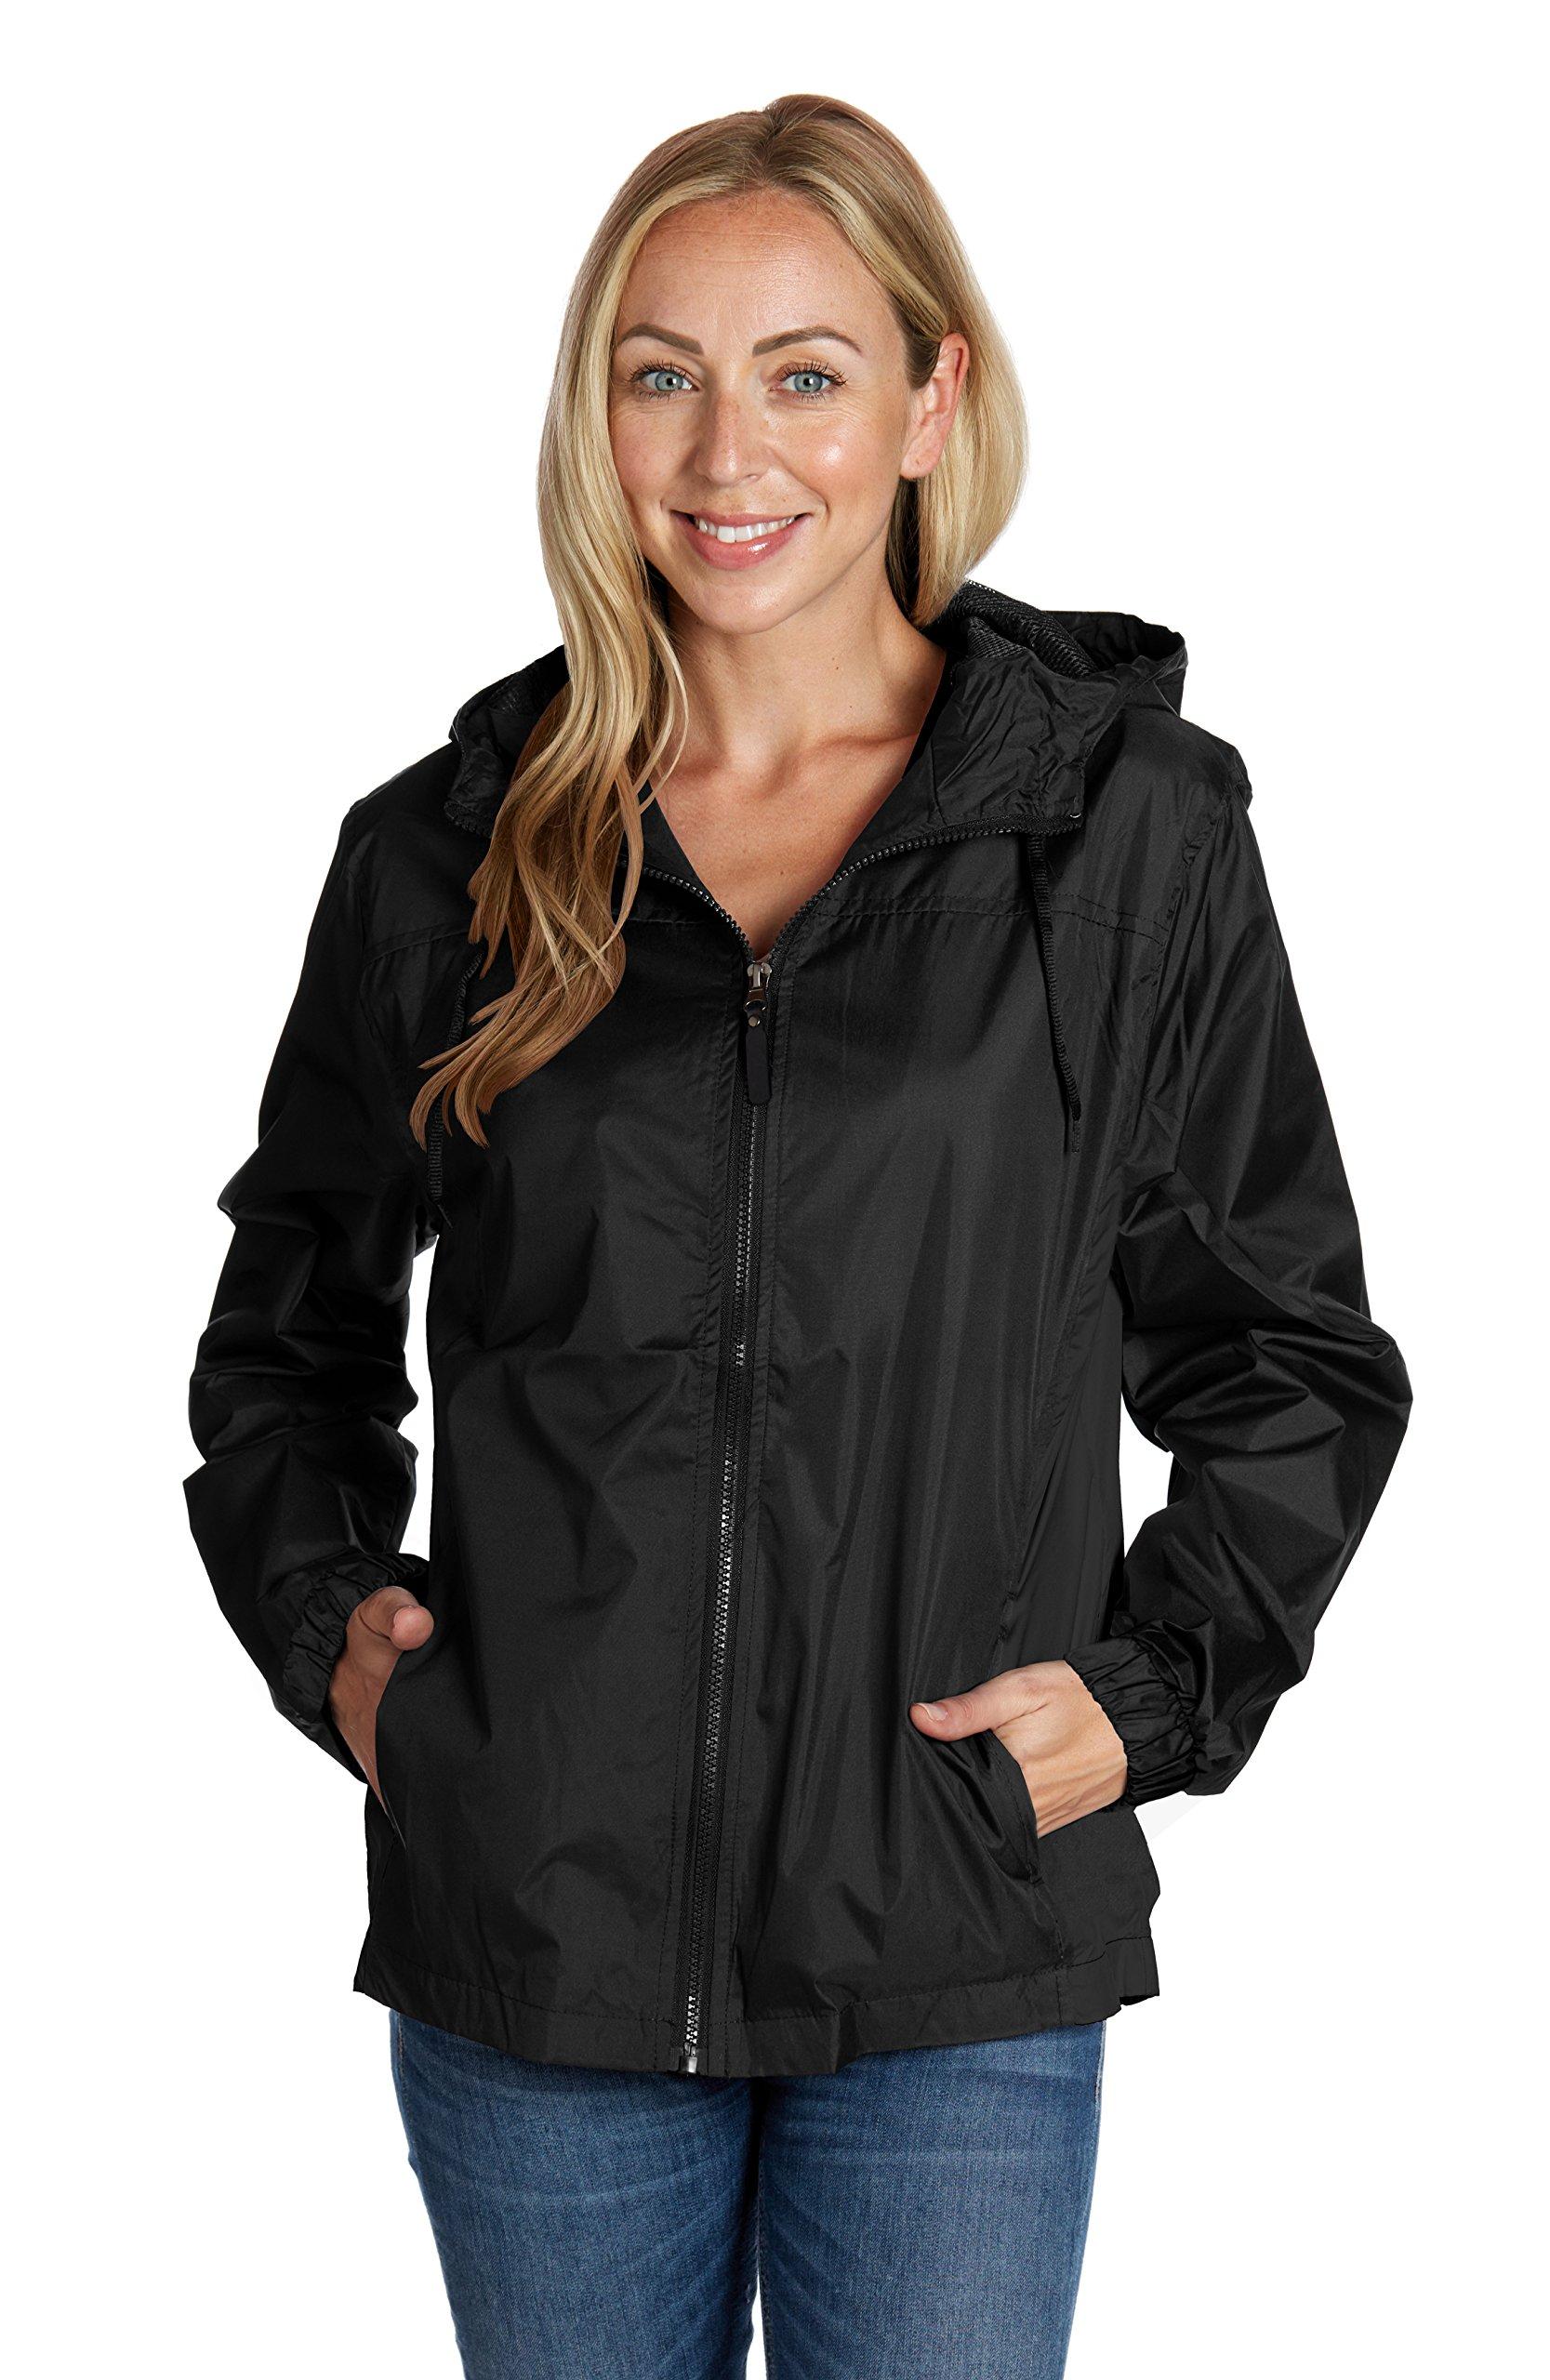 Equipment De Sport USA Black Fitness Jacket Womens Ladies Hooded Windbreaker (XL)